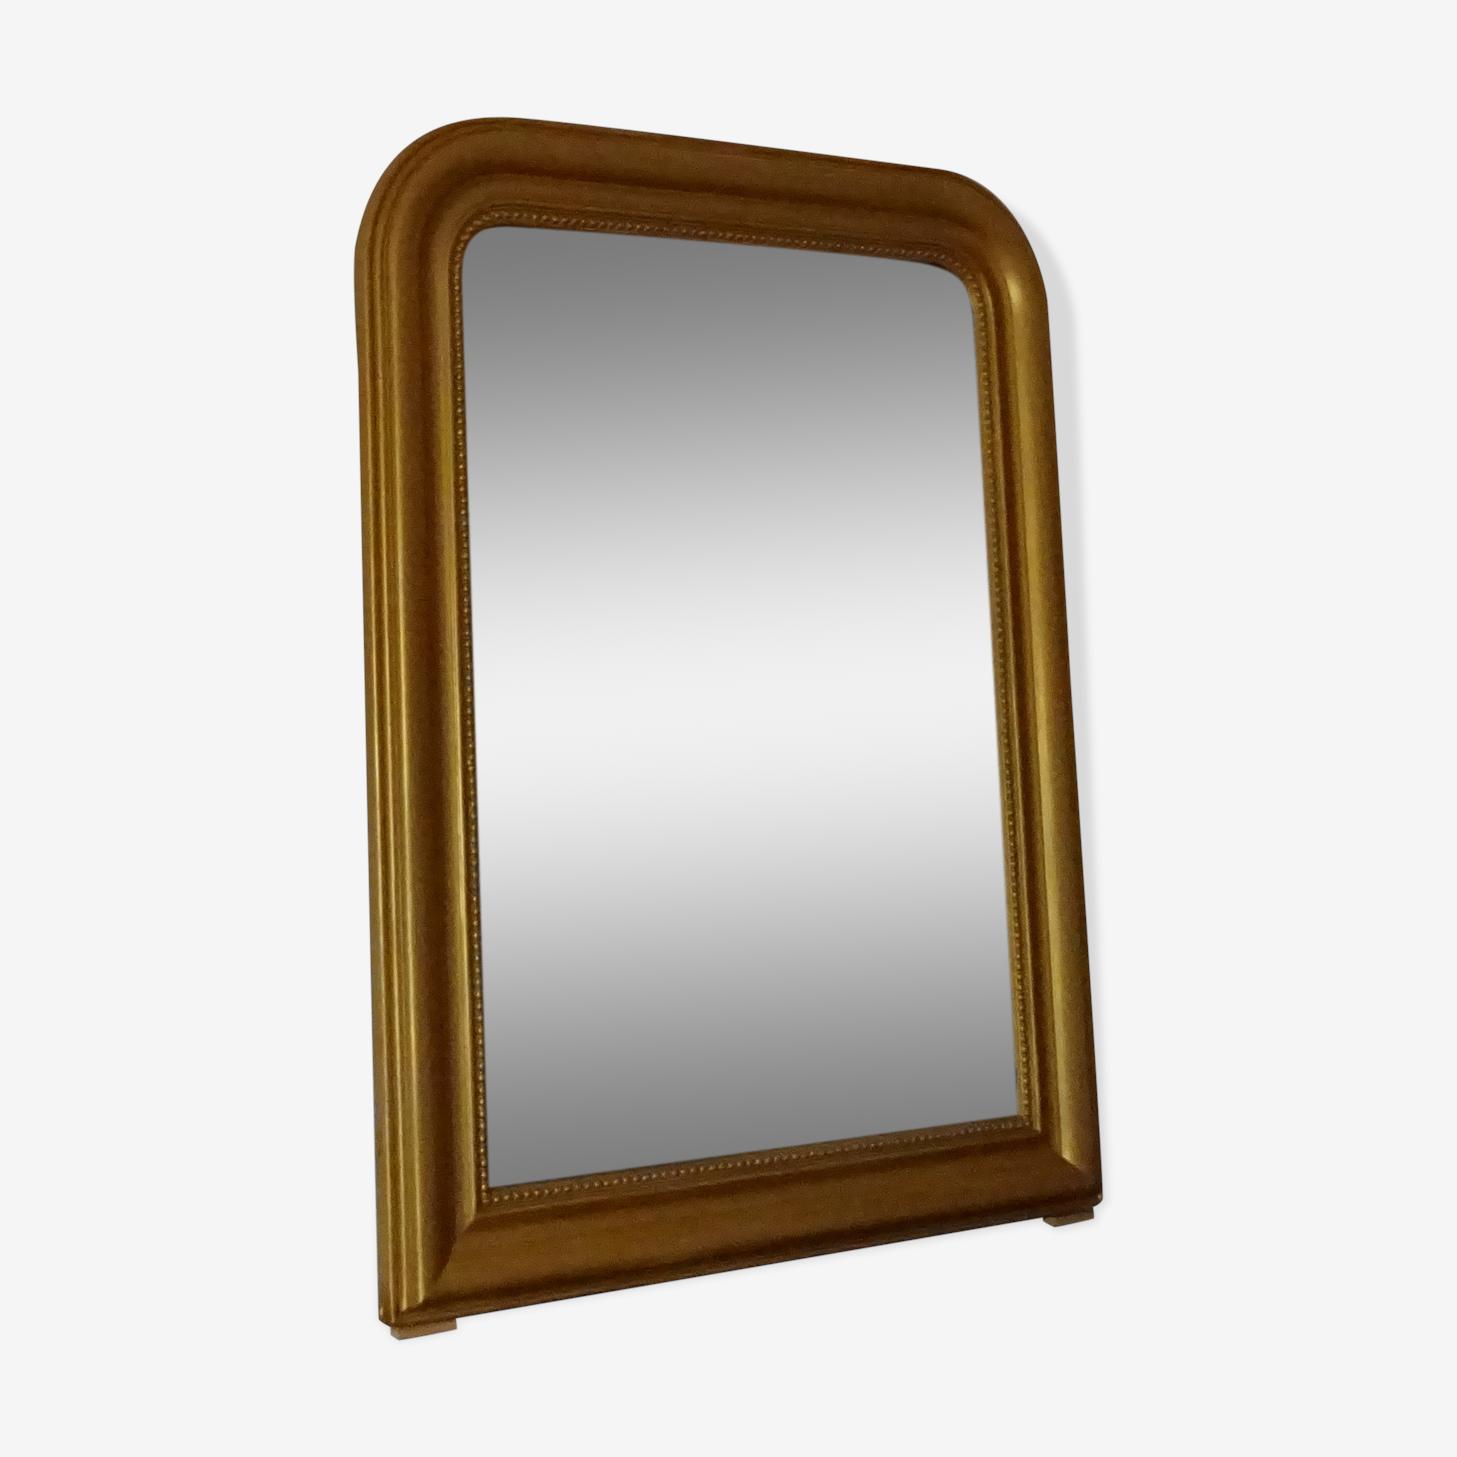 Louis Philippe mirror 102x76cm